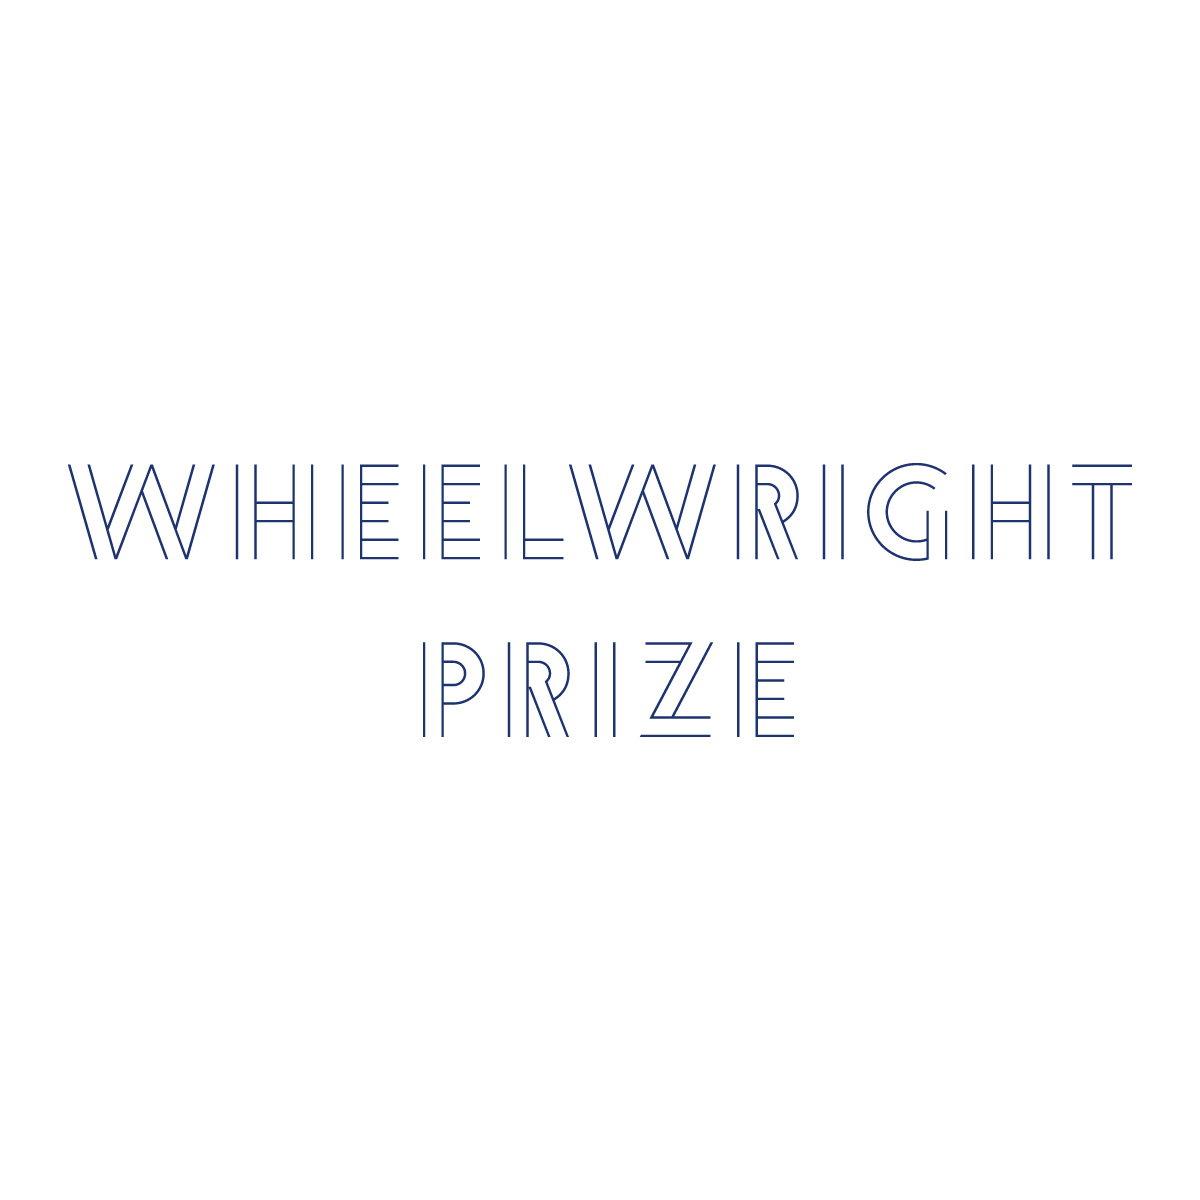 Harvard GSD Announces 2020 Wheelwright Prize.